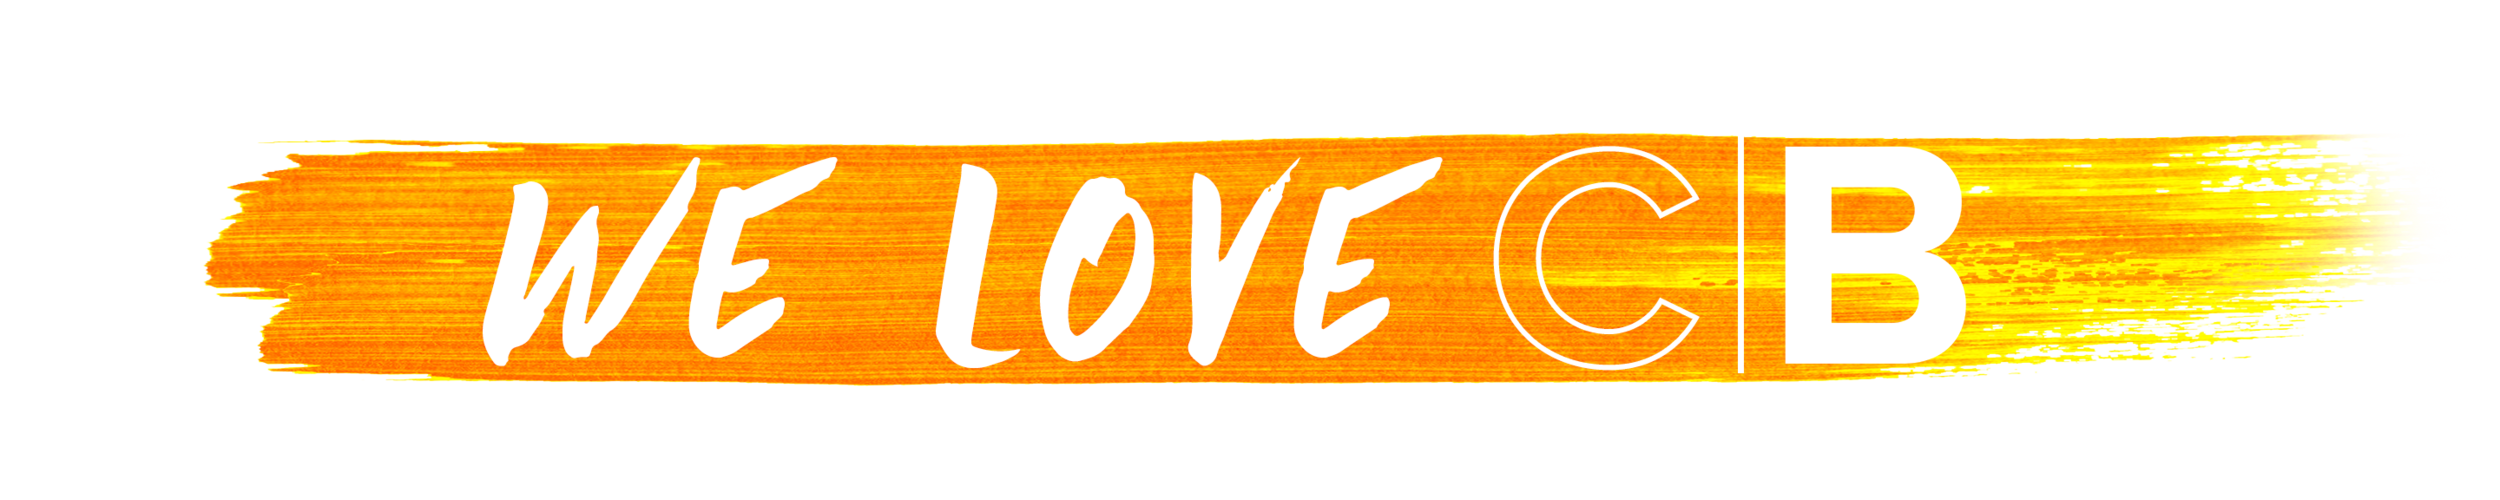 We Love C|B